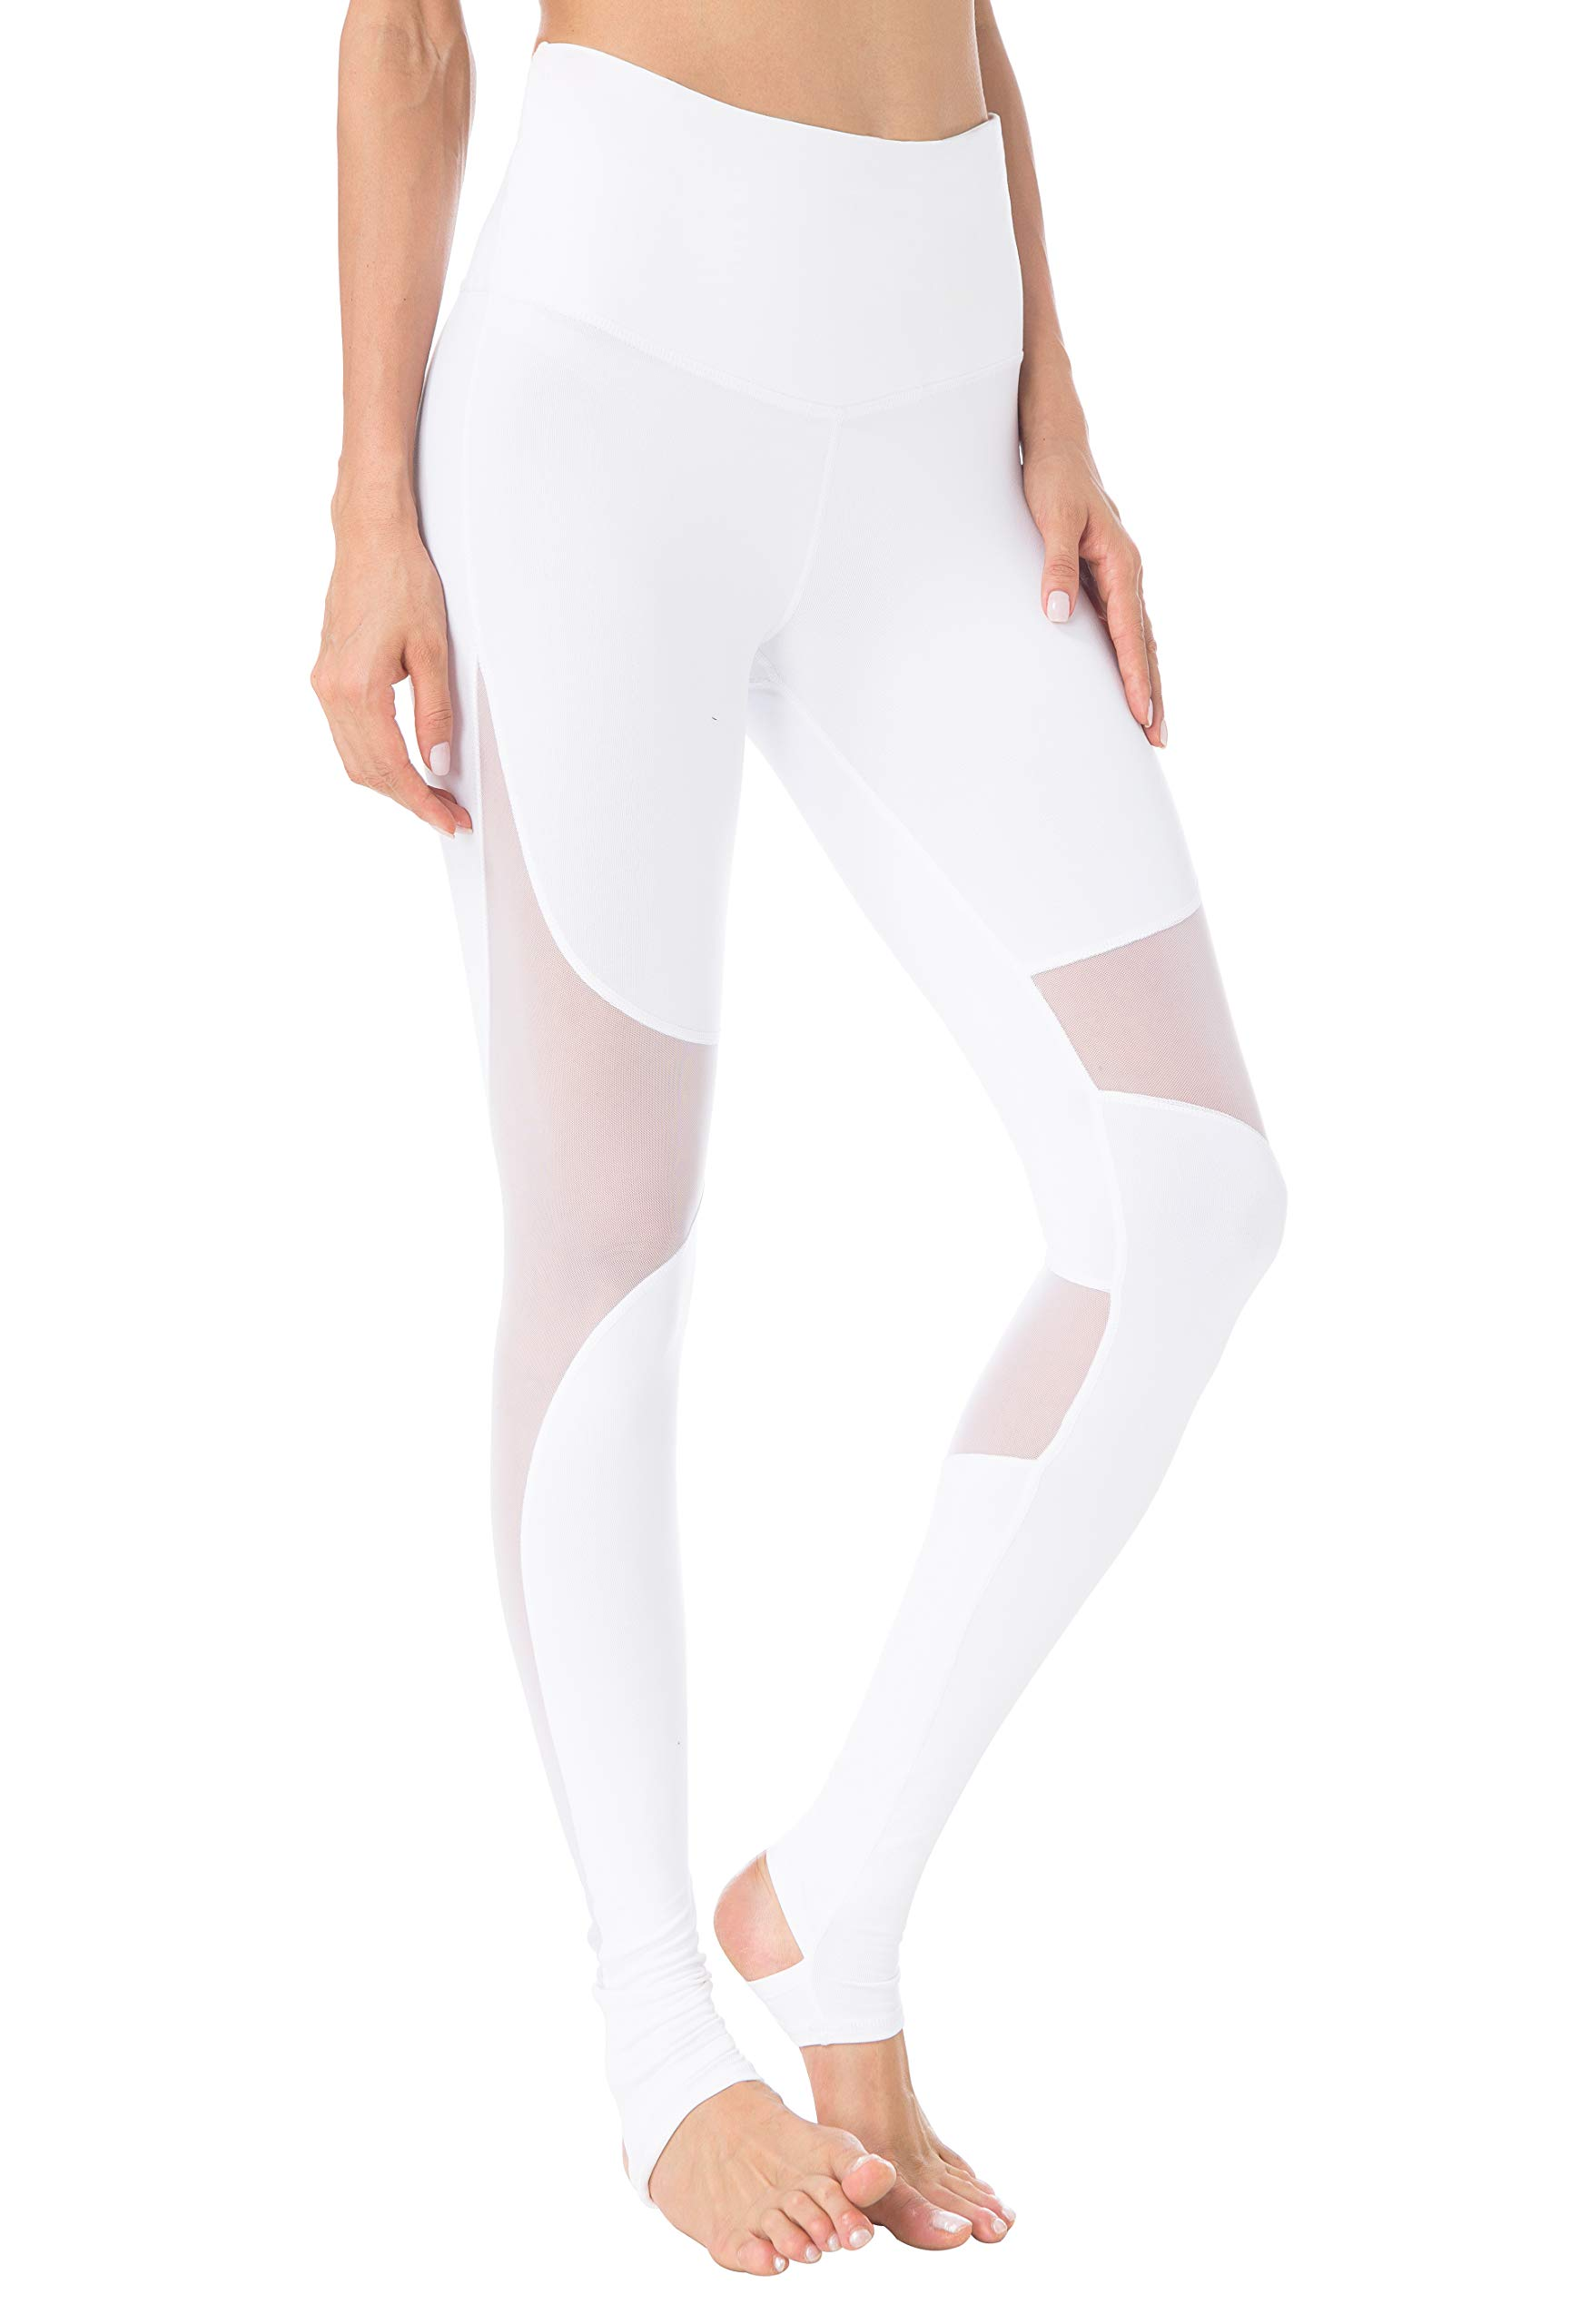 14ccbd5788 Galleon - Queenie Ke Women Power Stretch Leggings Plus Size Yoga Pants  Running Tights Size L Color White Stirrup